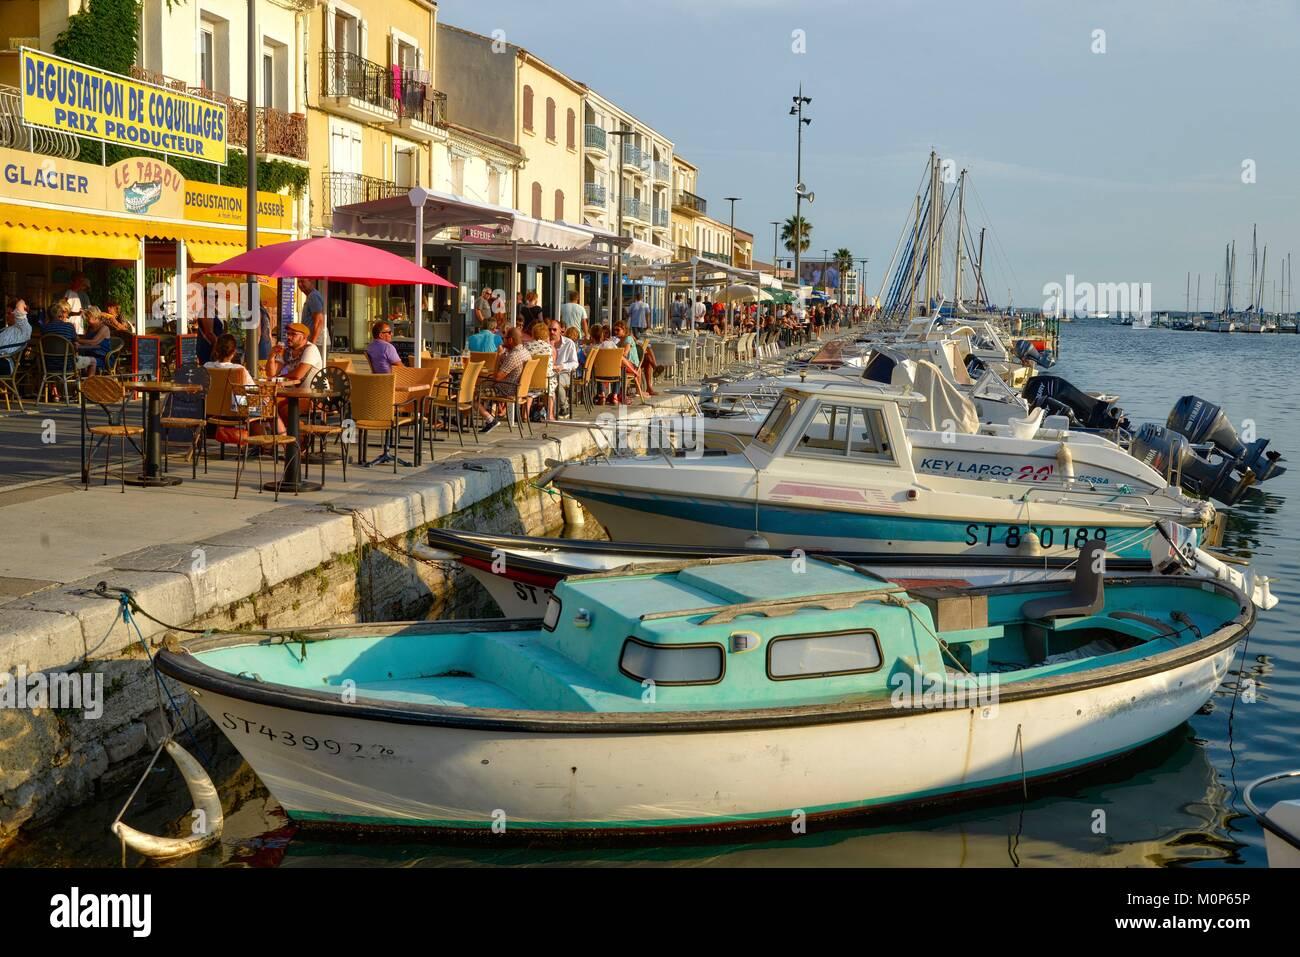 France,Herault,Meze,lagoon of Thau,marina,Café terrace on a quay - Stock Image